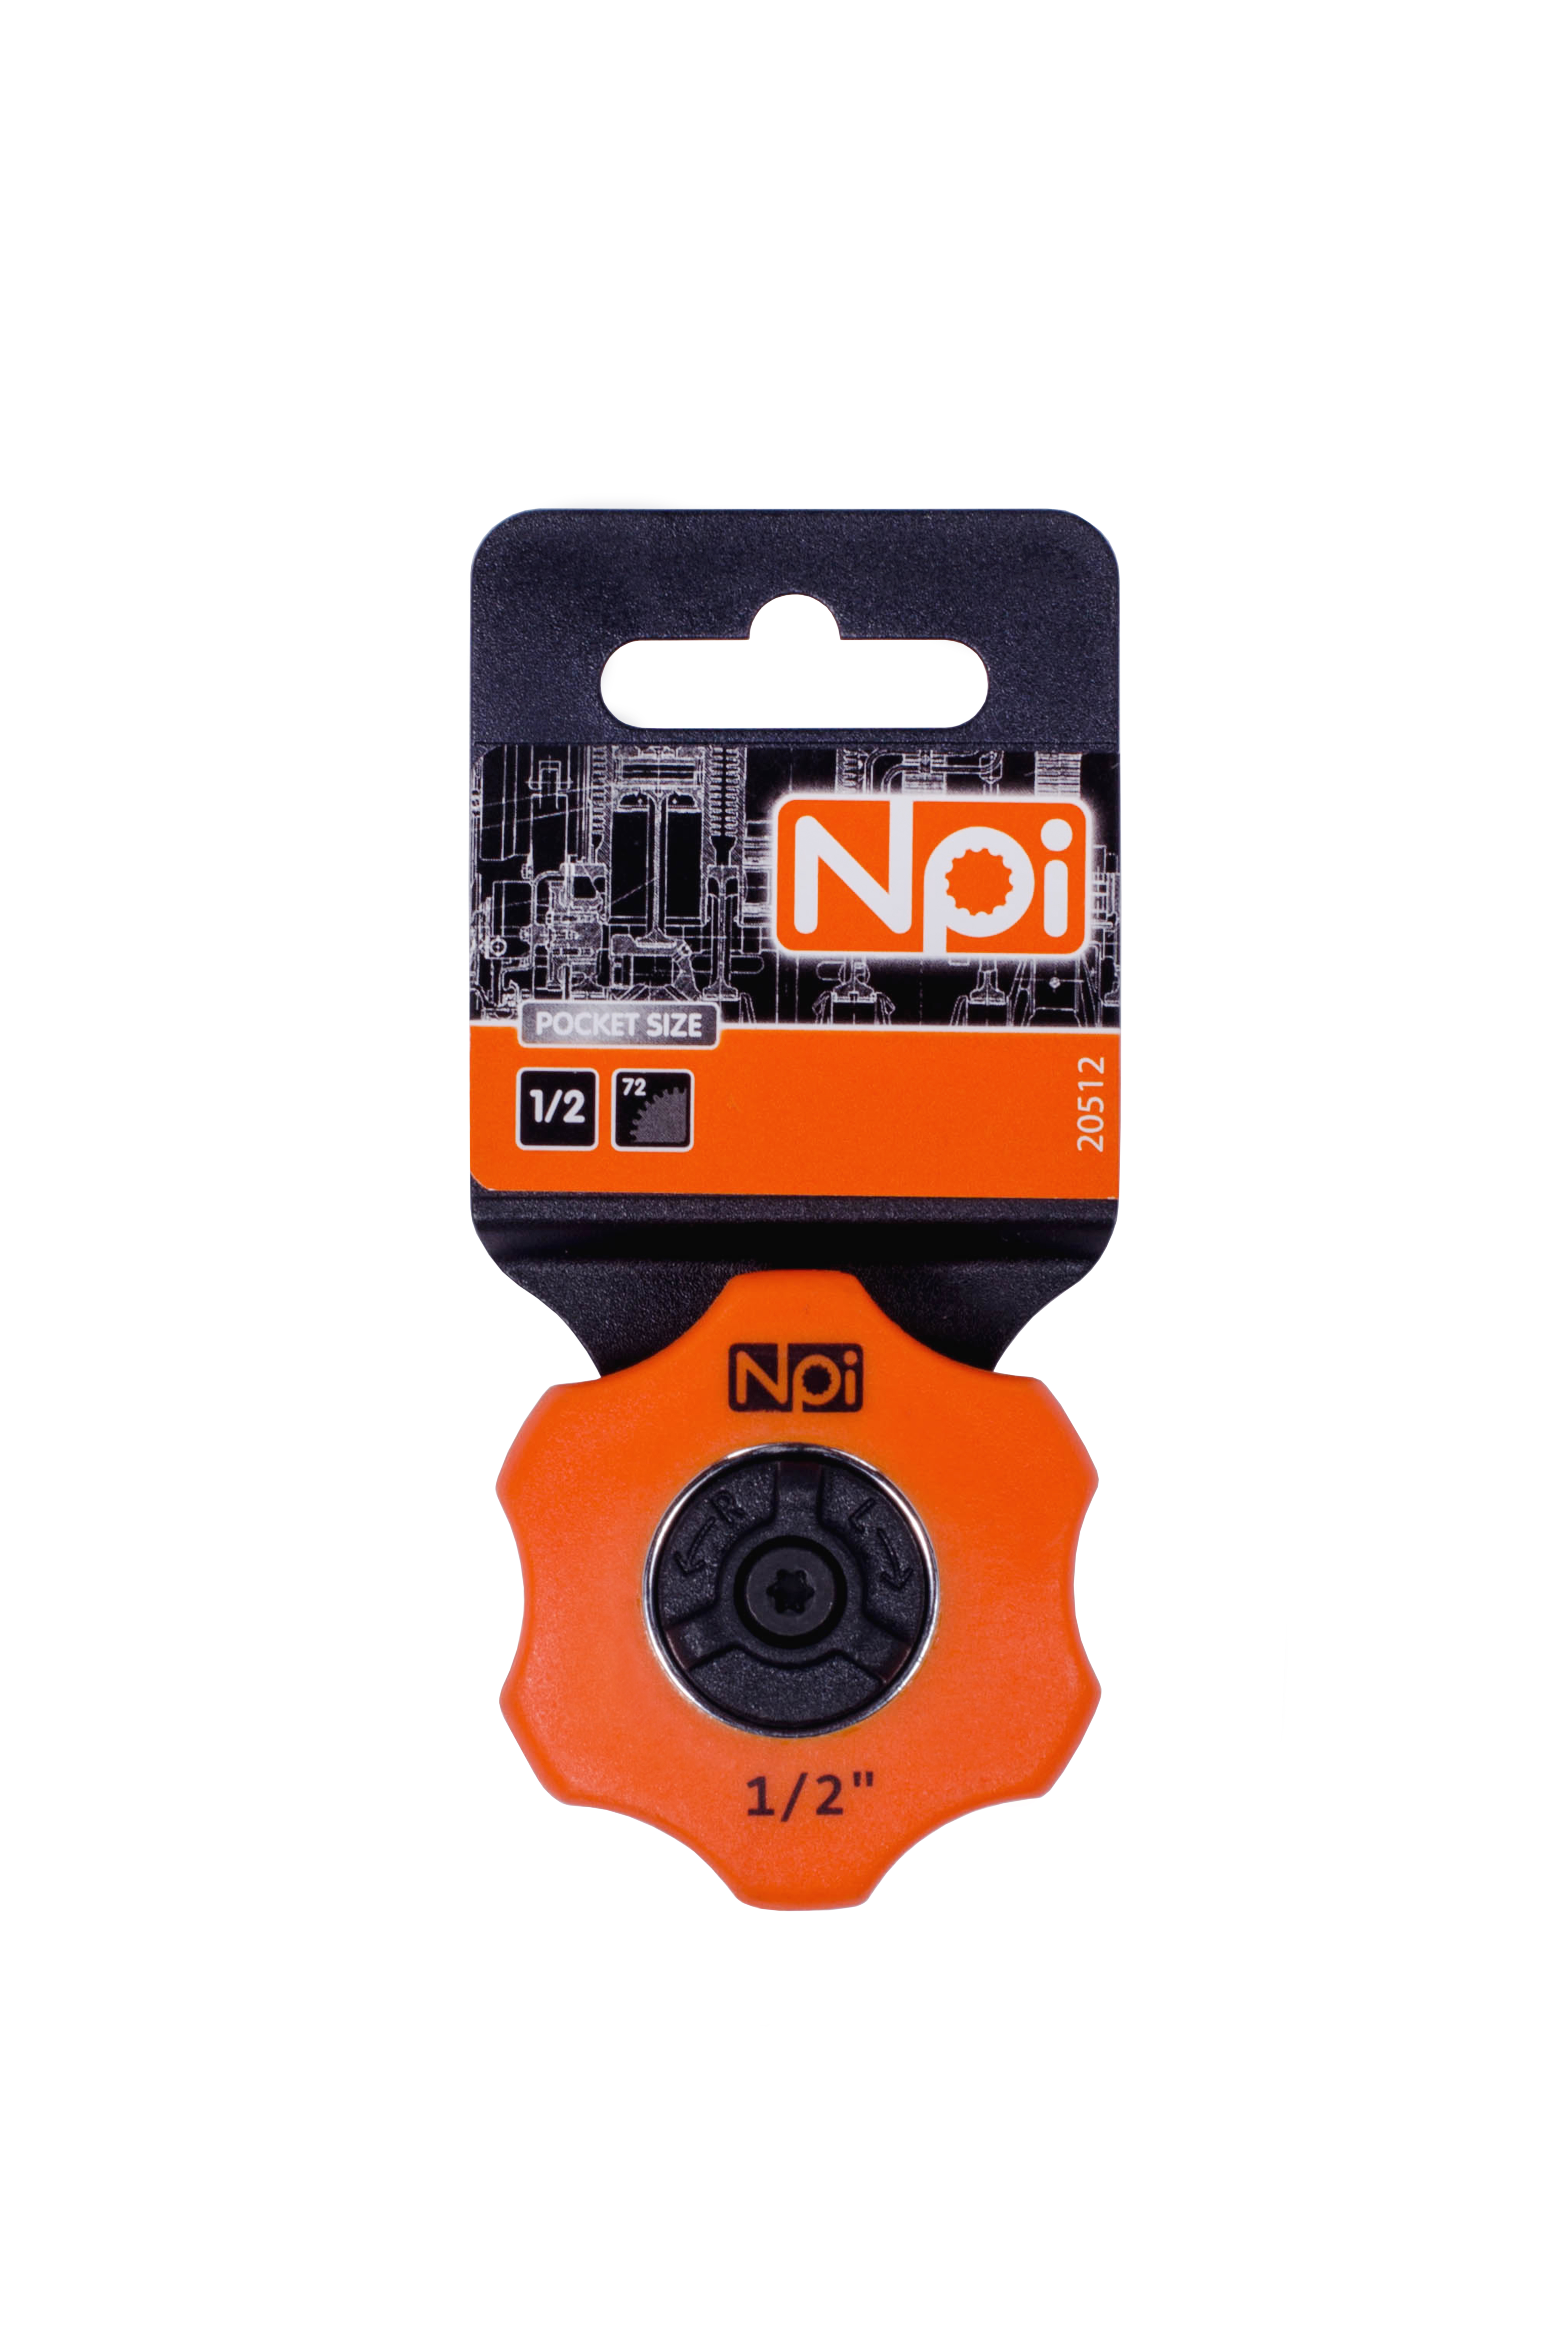 Трещотка Npi 20512  трещотка npi 3 в 1